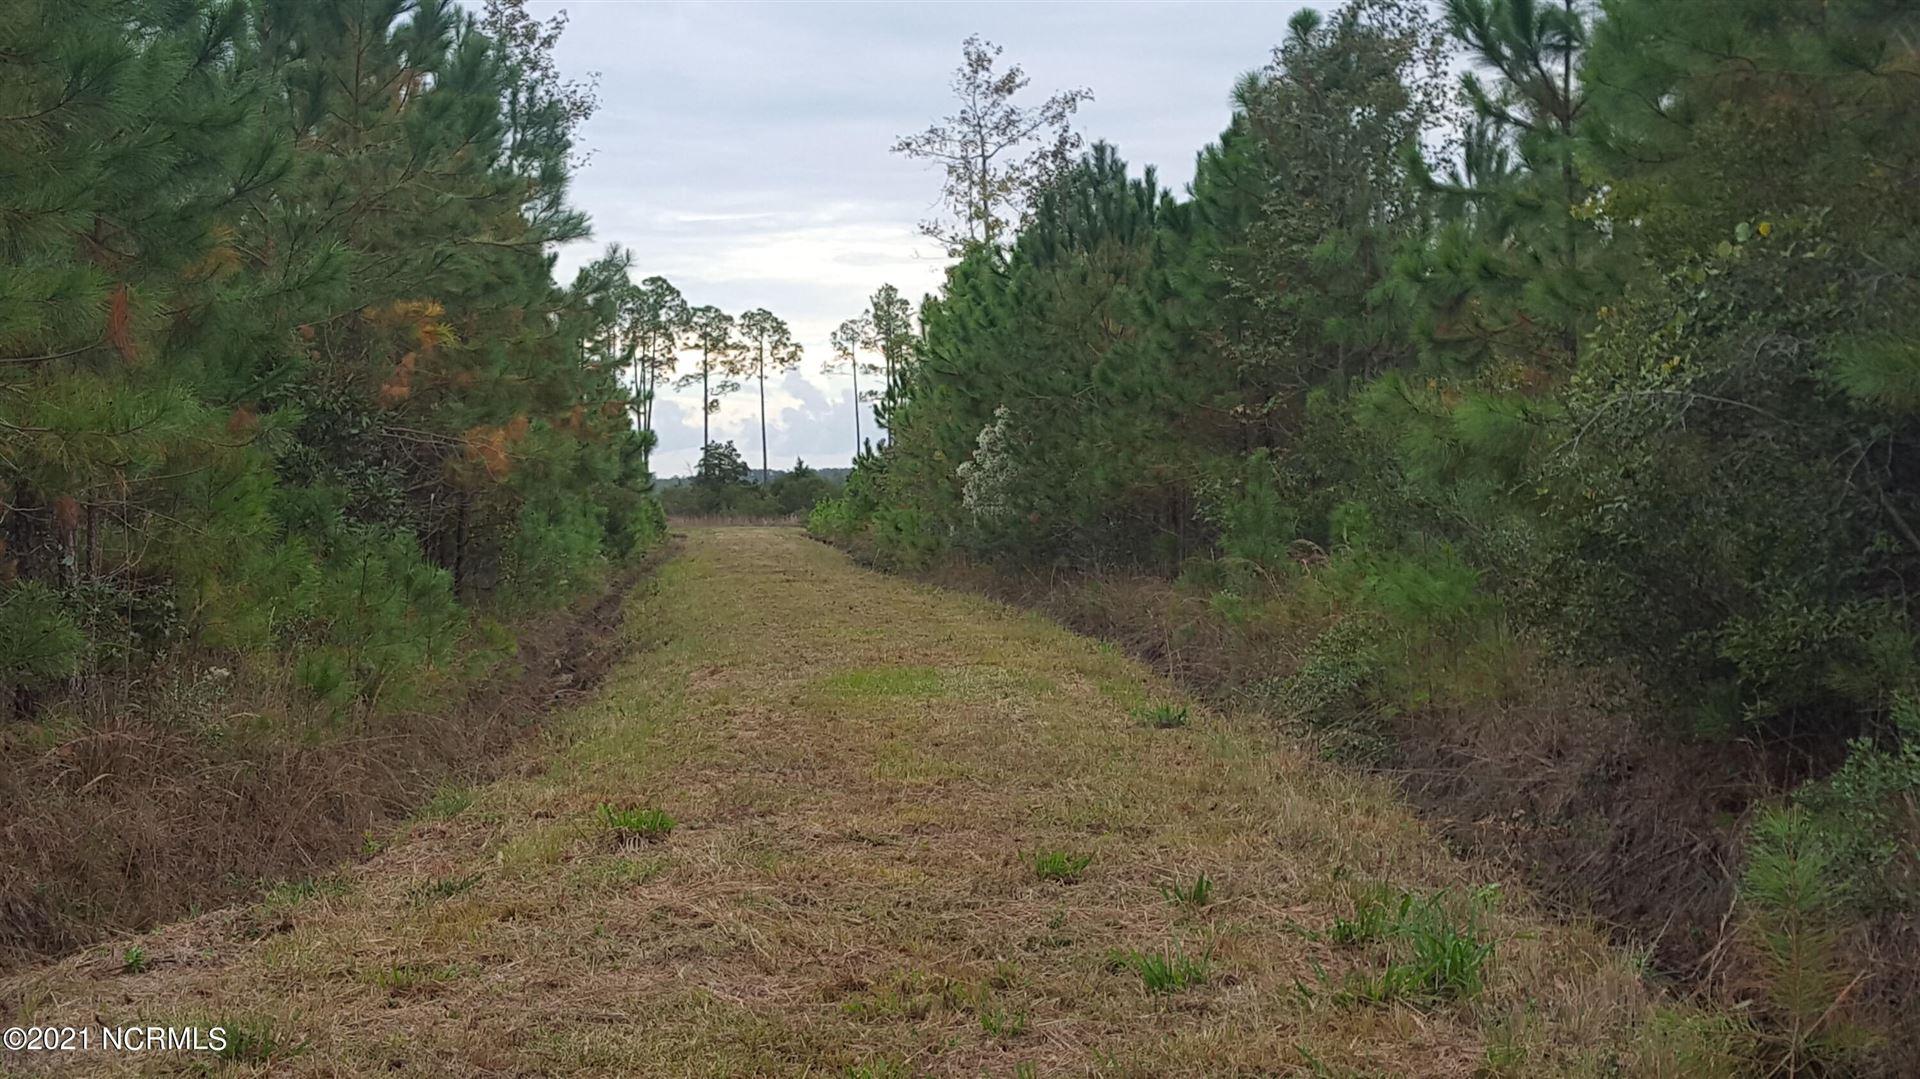 Photo of 3001 Upper Neck Road, Bayboro, NC 28515 (MLS # 100276012)